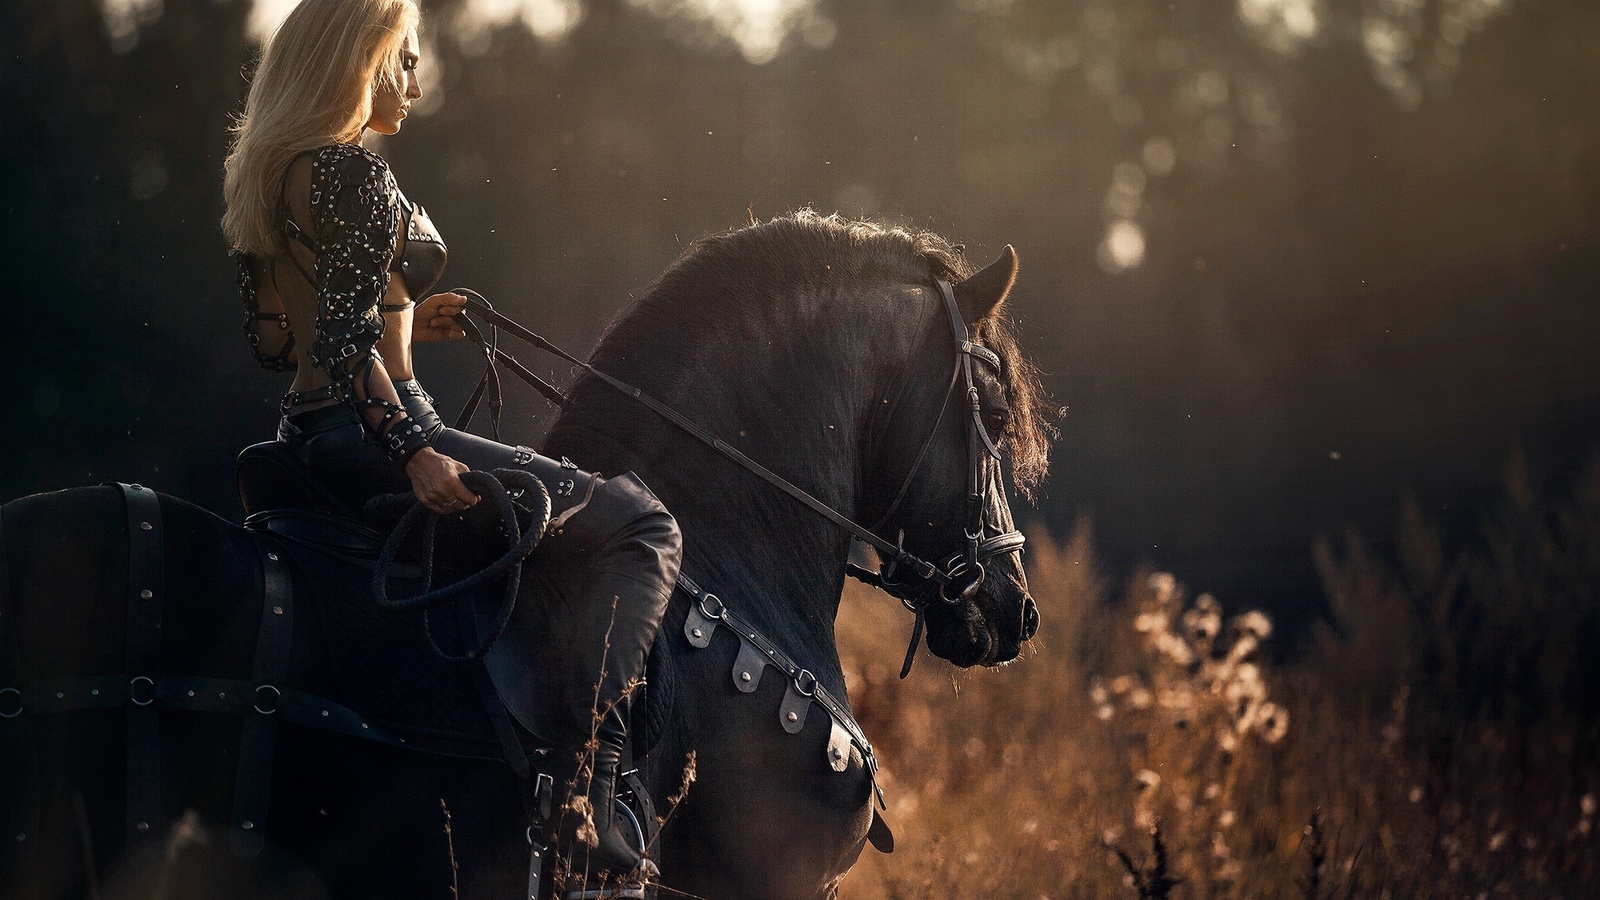 daria lefler, amazon, warrior, woman, with, black